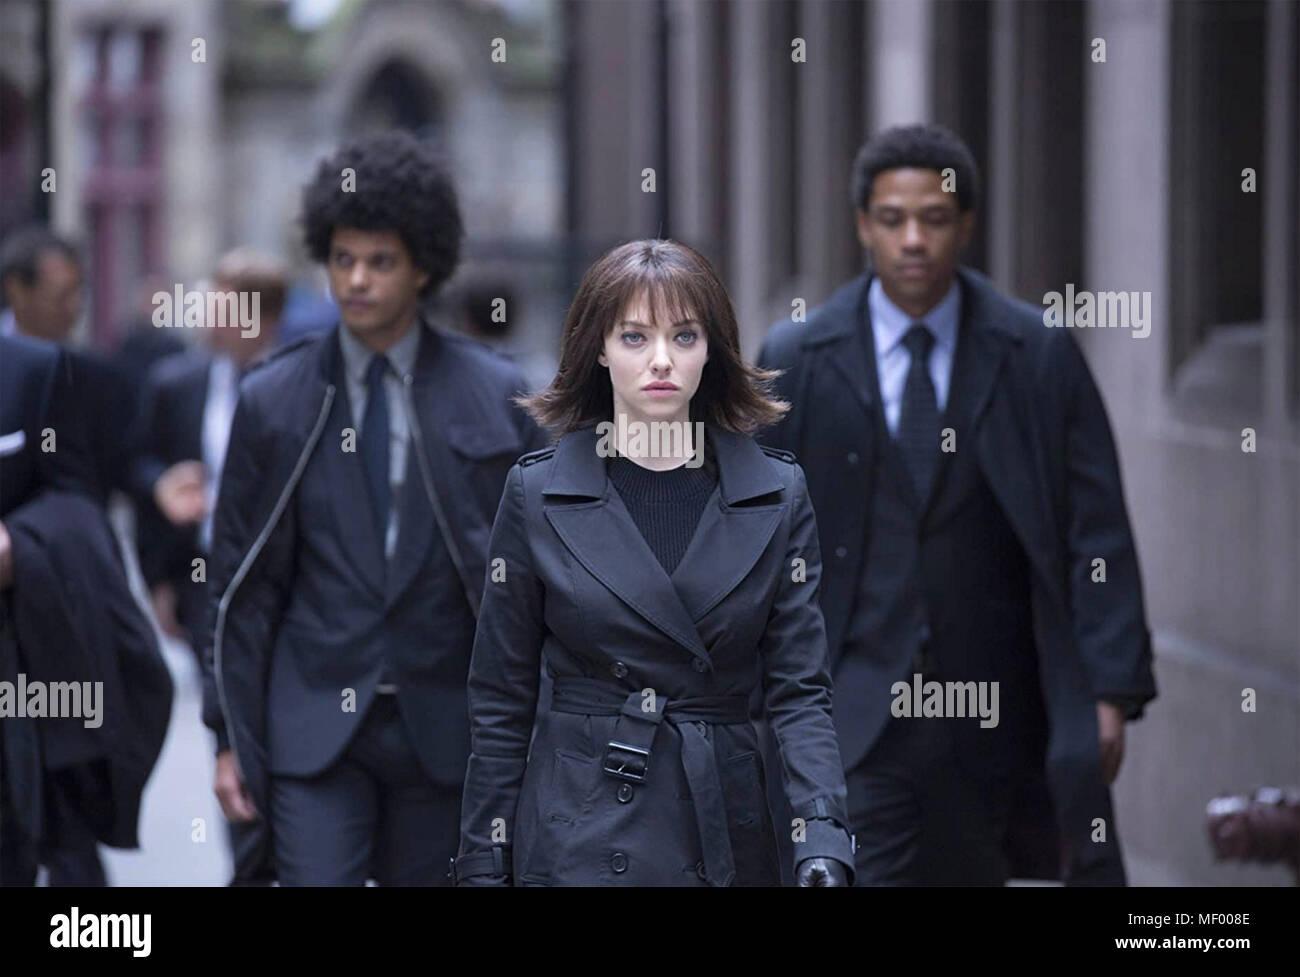 ANON 2018 Netflix film with Amanda Seyfried - Stock Image